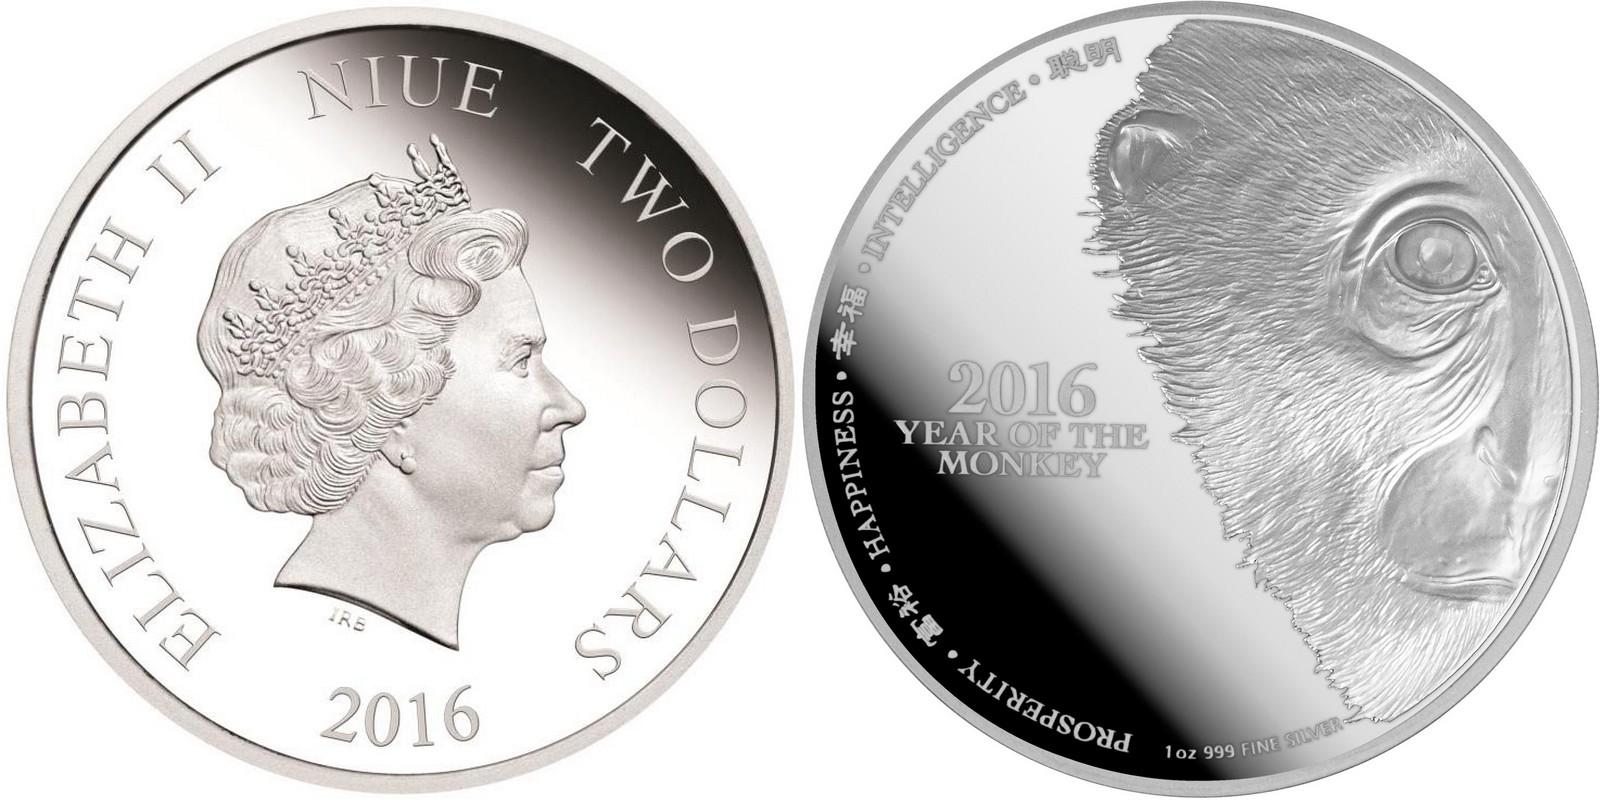 niue 2016 singe MZ mint